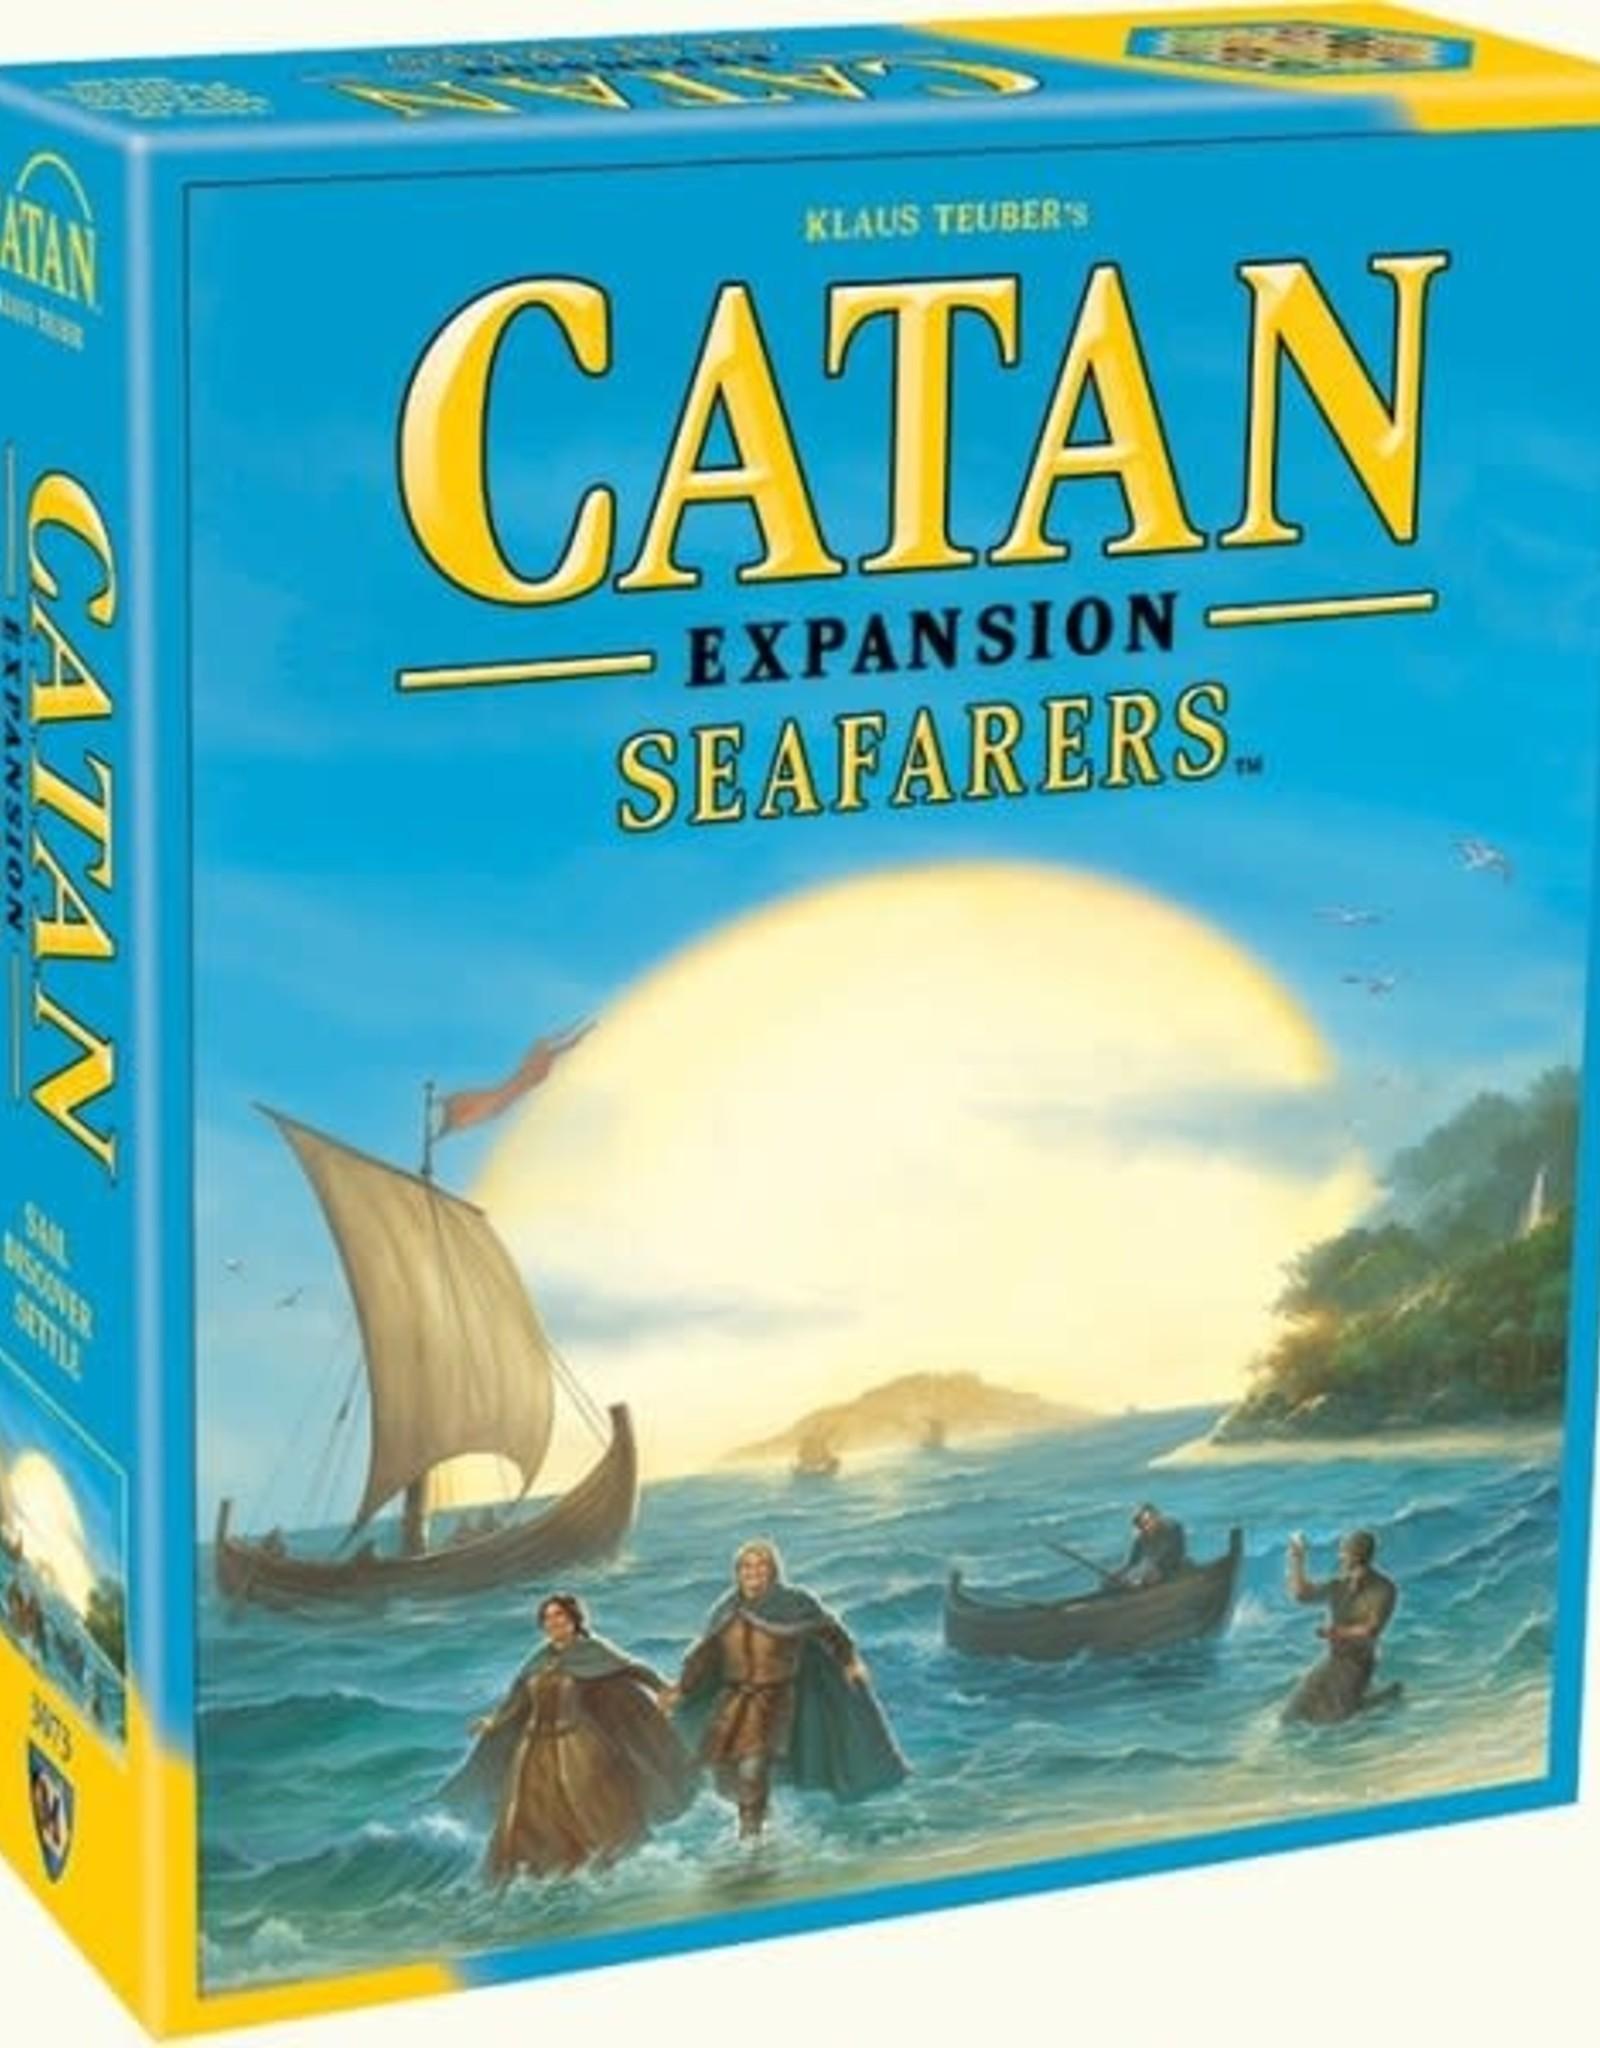 Catan Studio Catan Seafarers Expansion